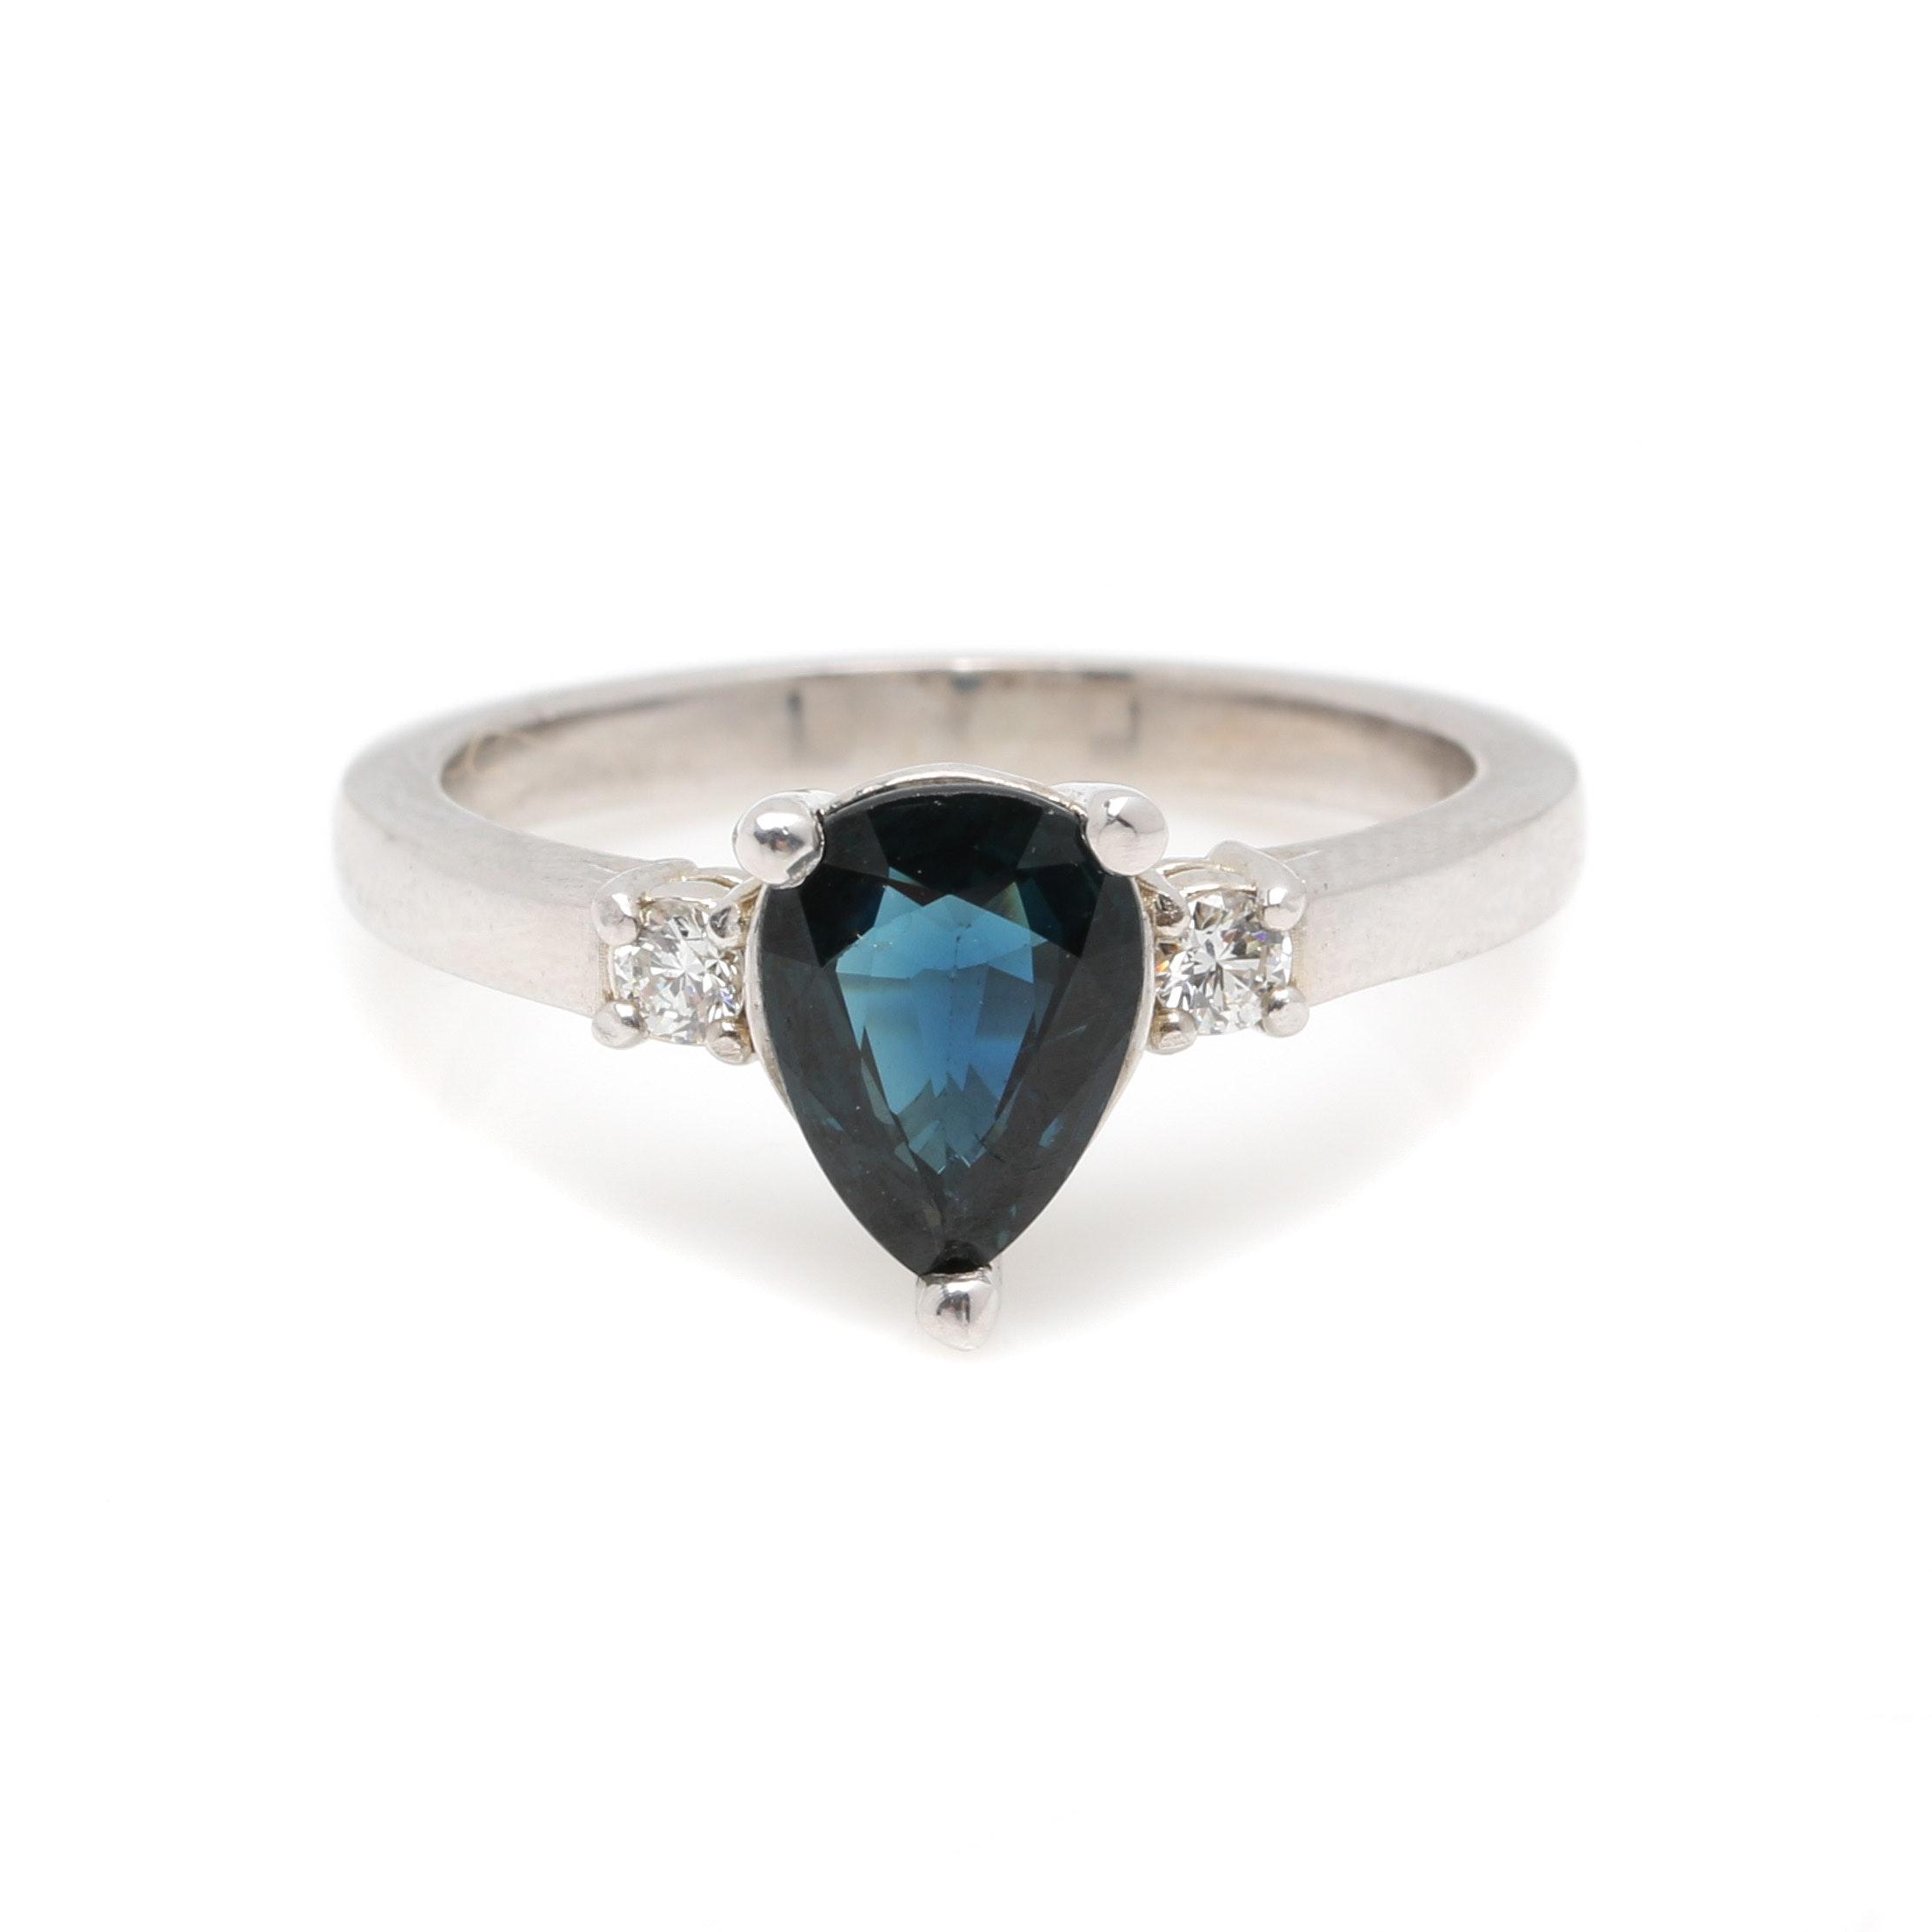 14K White Gold 1.24 CT Sapphire and Diamond Ring